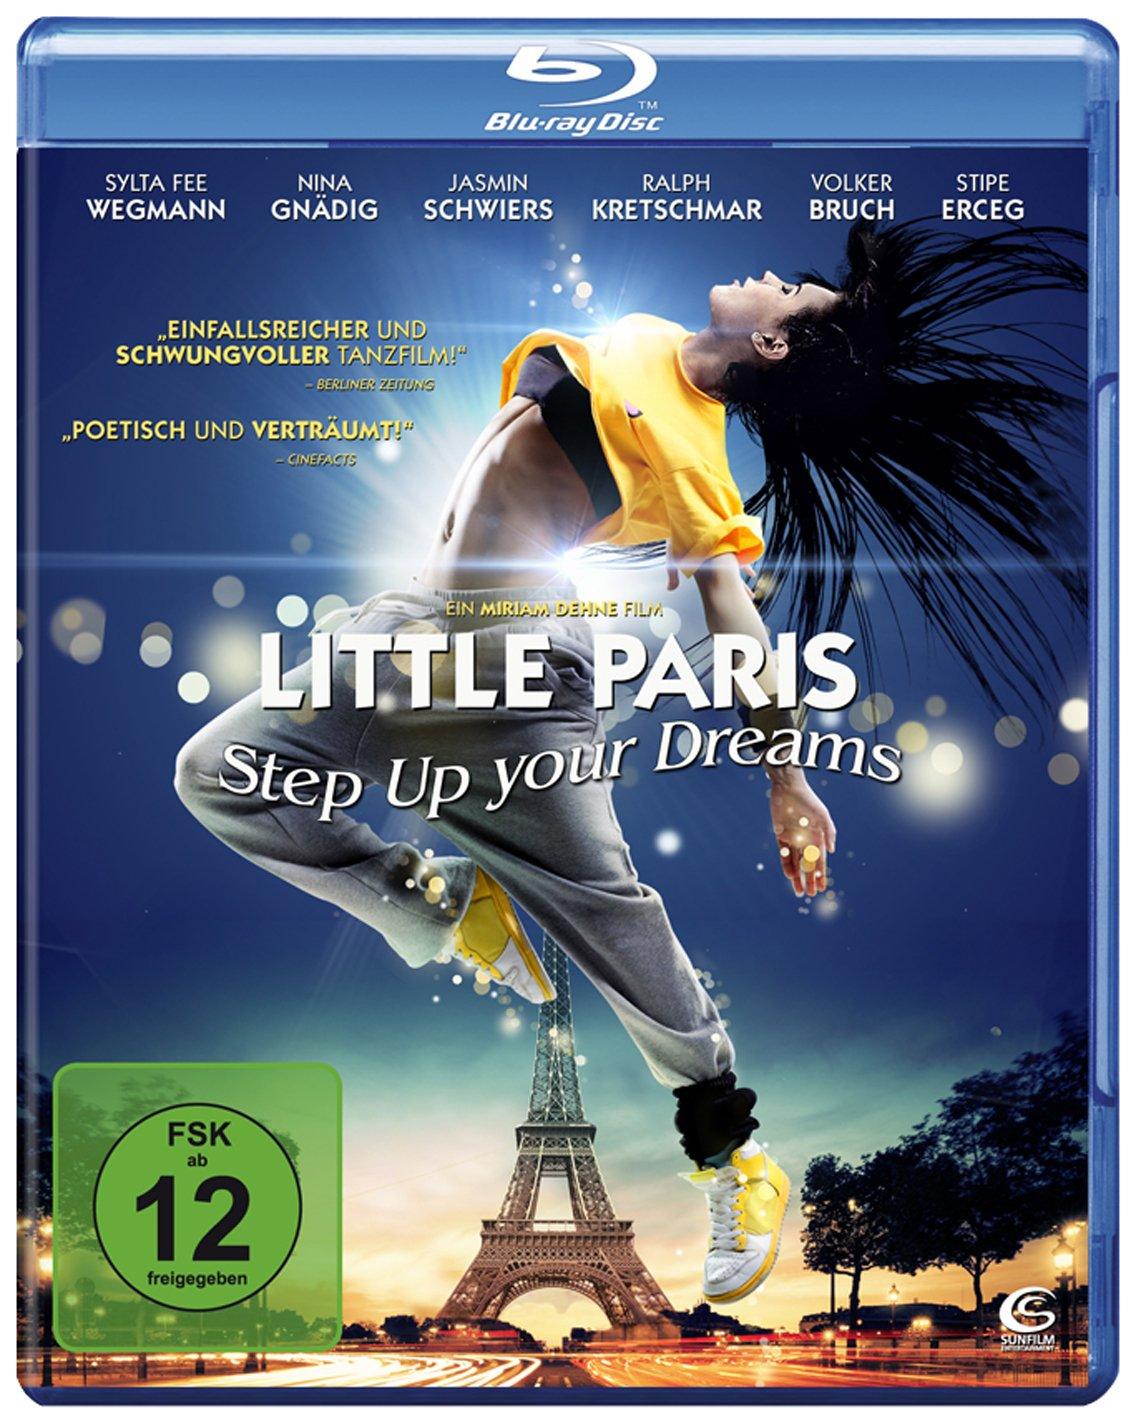 Little Paris - Step up your Dreams [Blu-ray]: Amazon.de: Sylta Fee ...